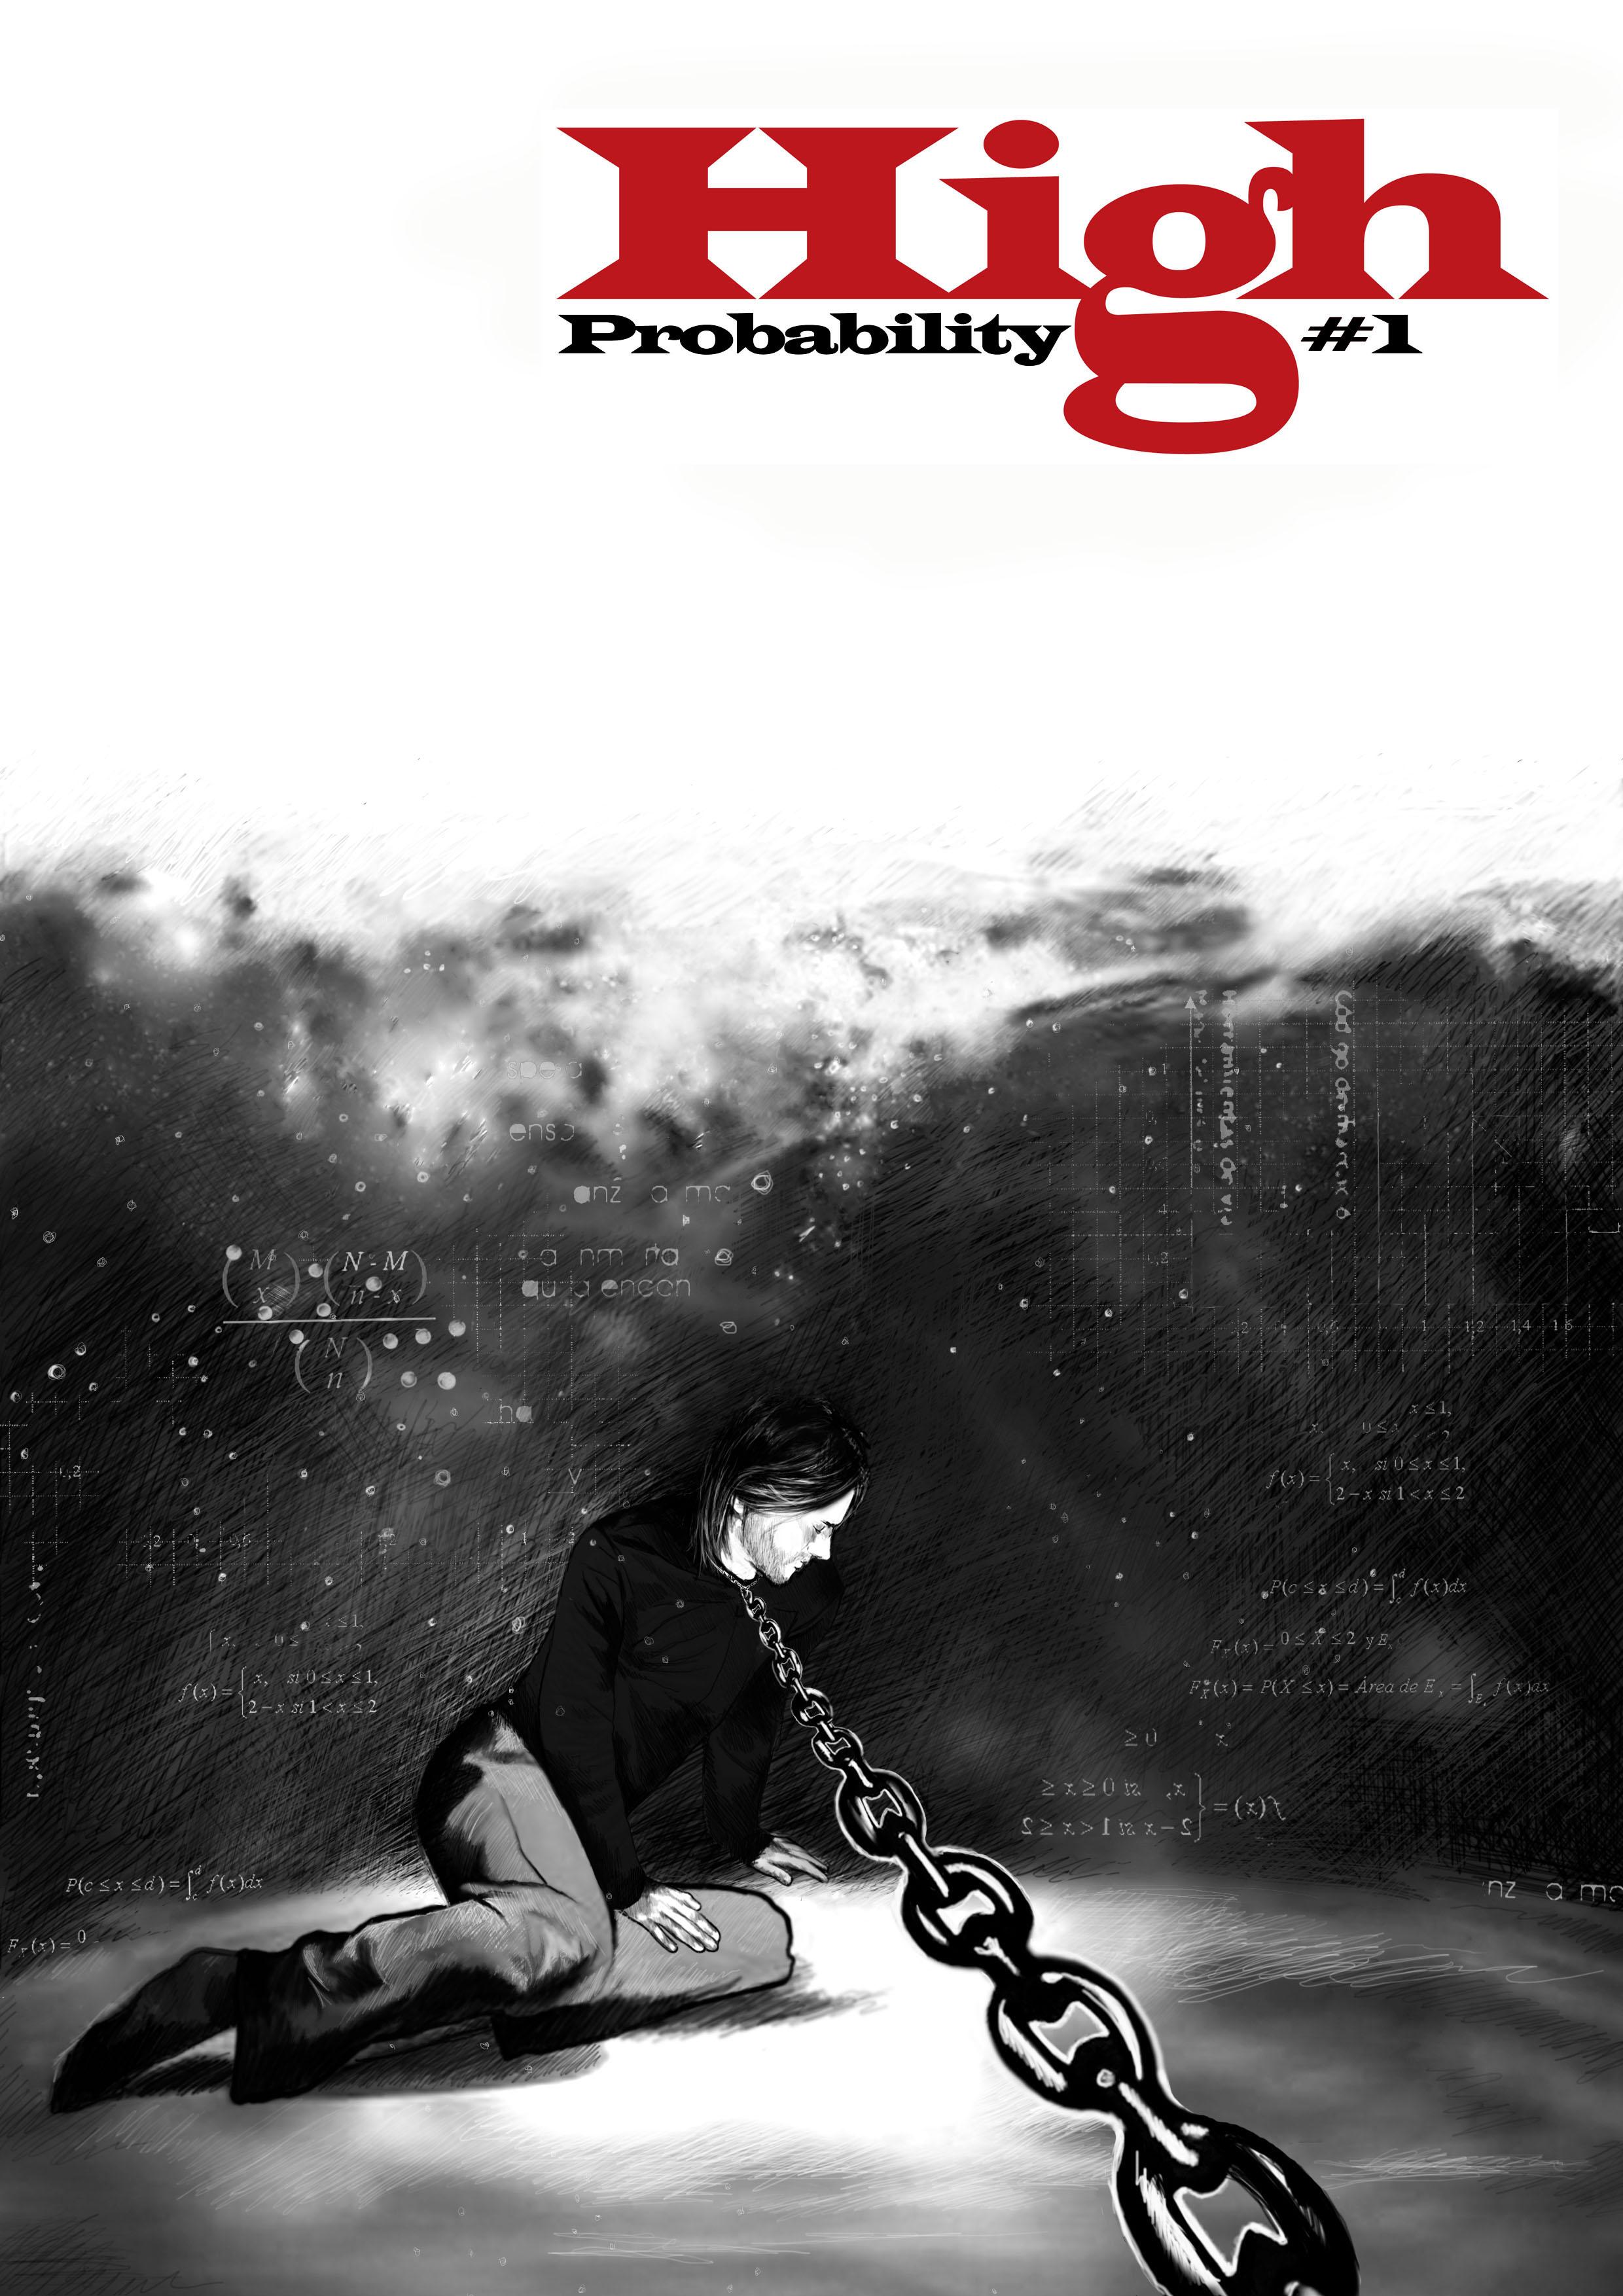 http://thaisgarcias.com/wp-content/uploads/2014/11/1-comic.jpg